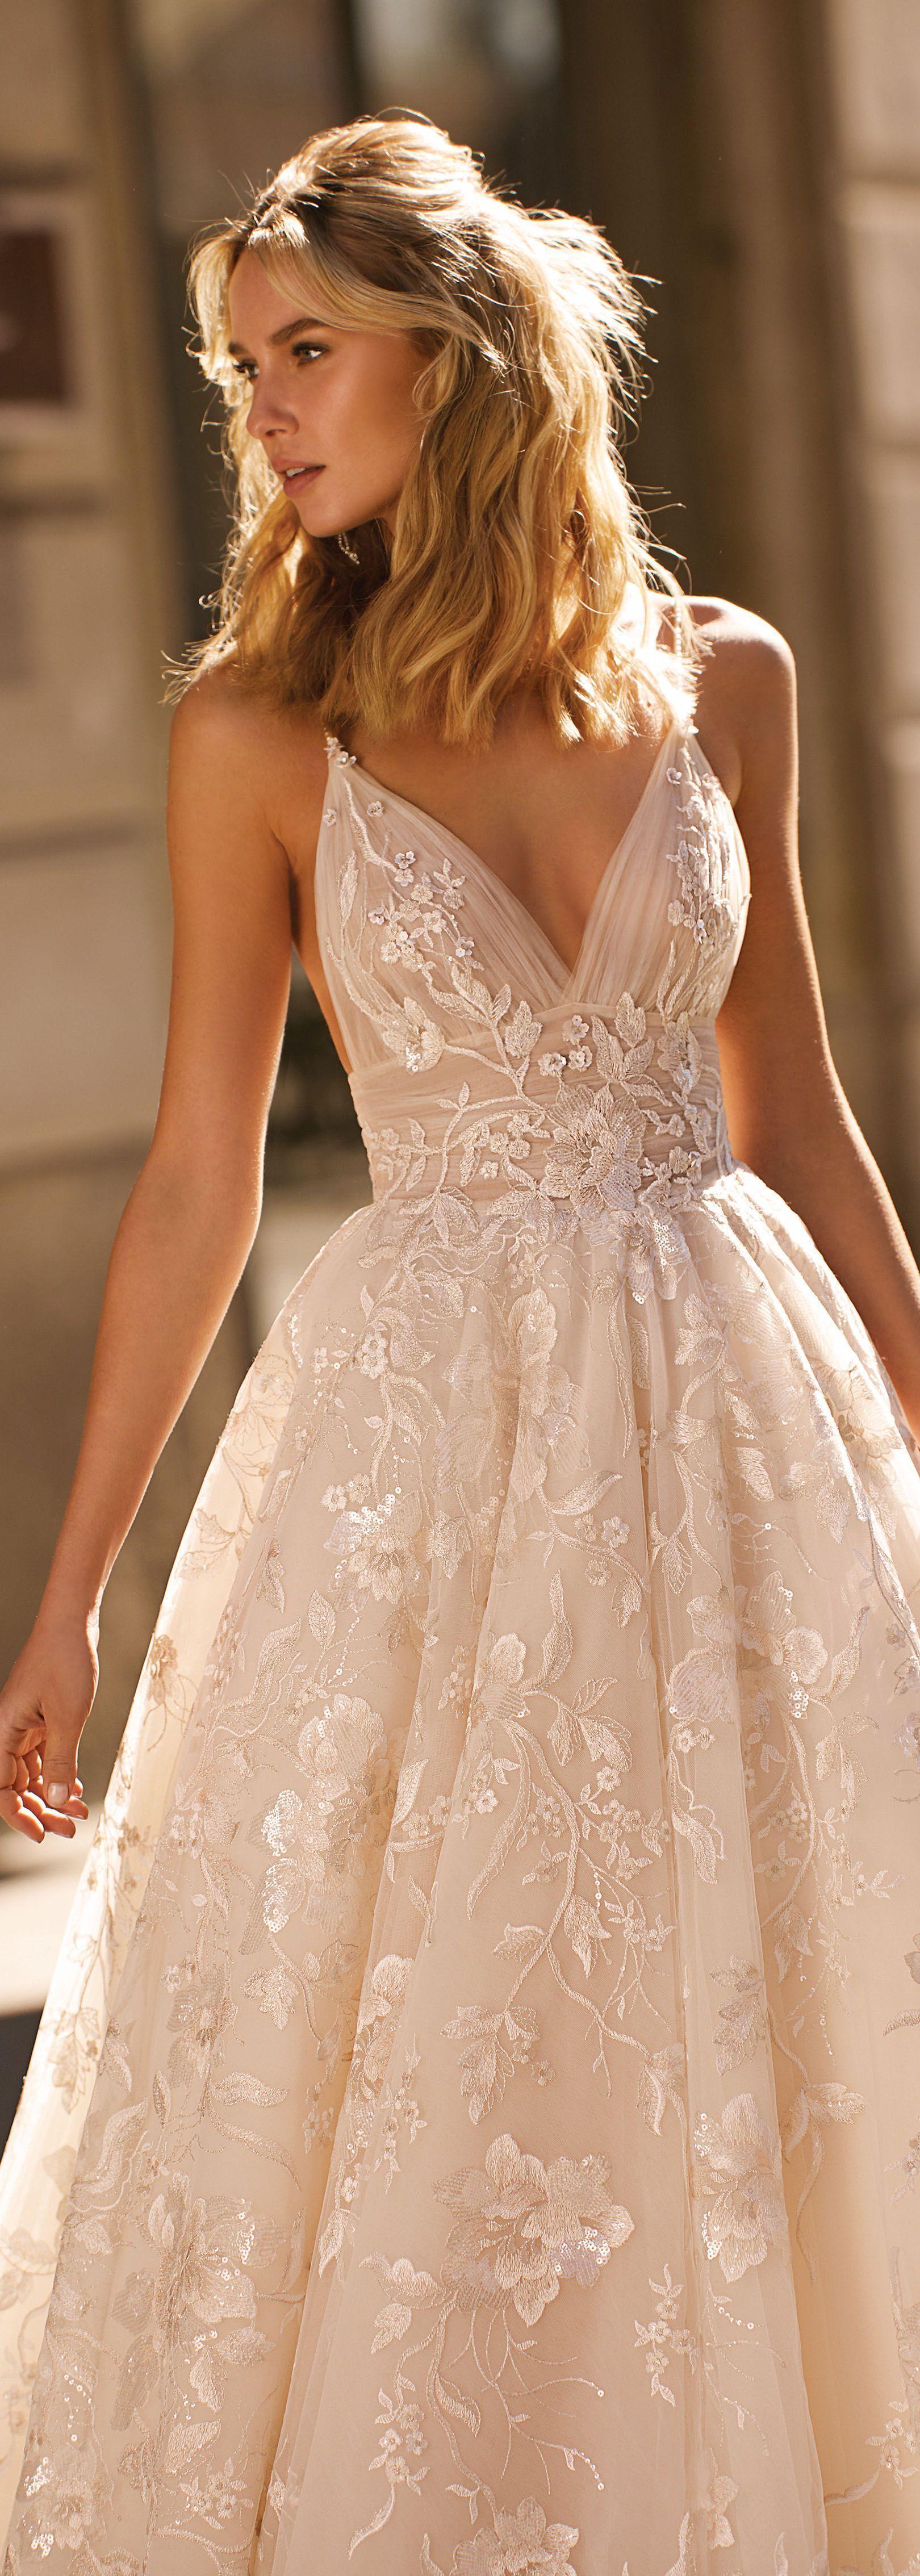 Photo of Berta #bertaweddingdress new Berta Milano bridal couture collection – Meerjungfraus